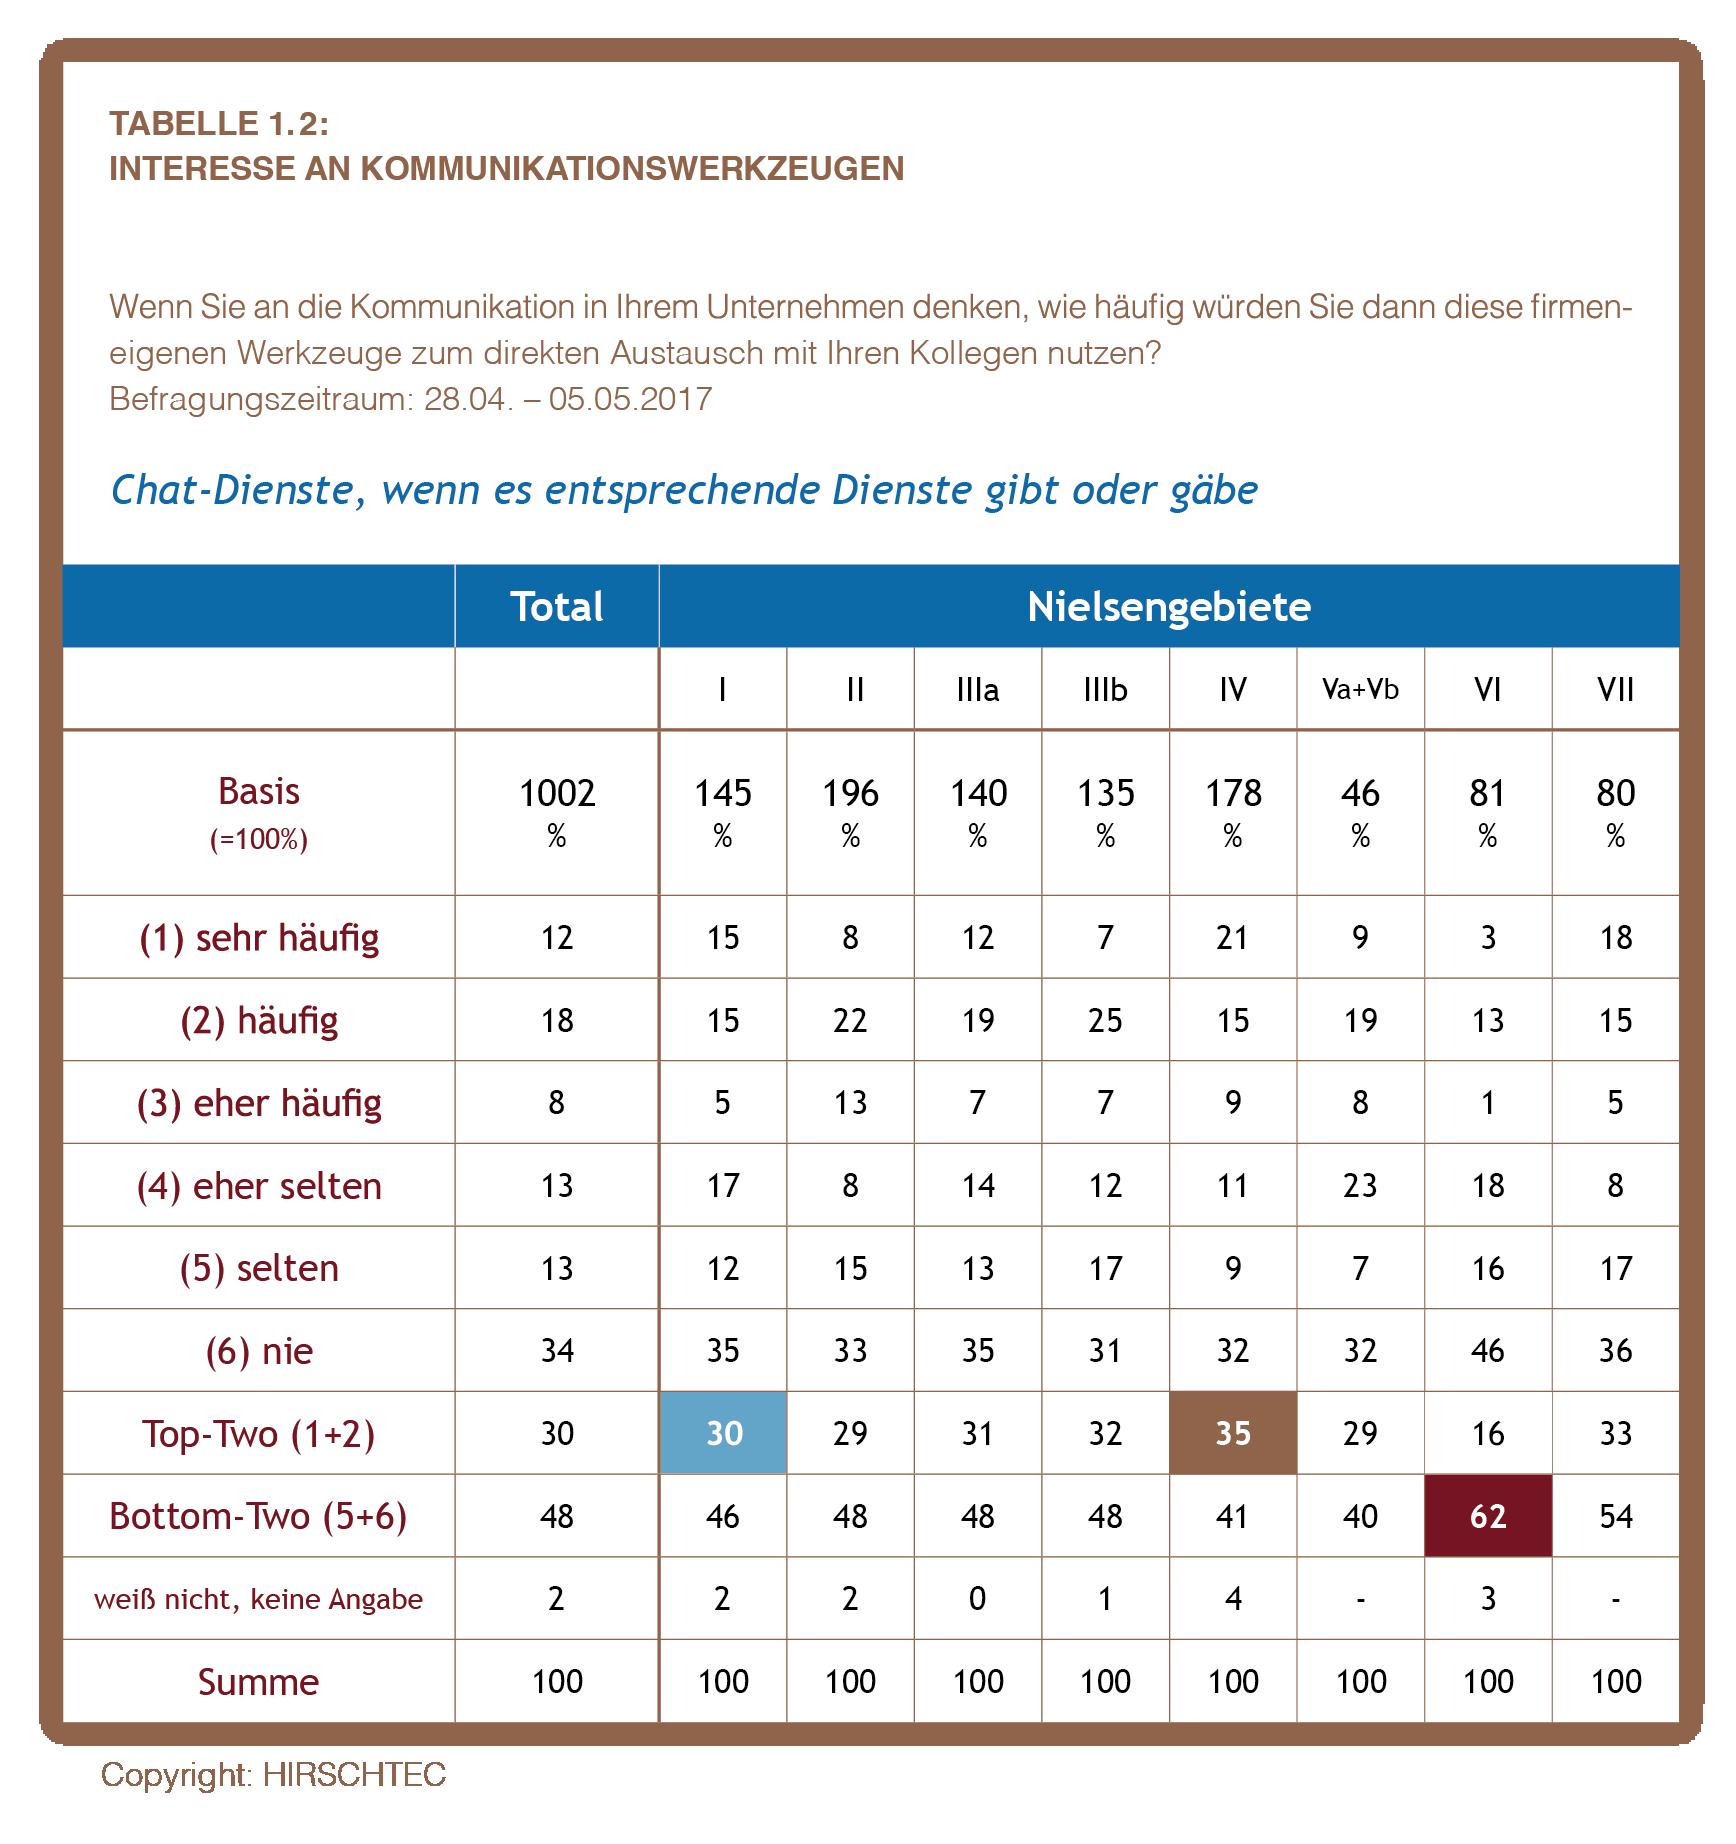 Hh Tabelle 1.2